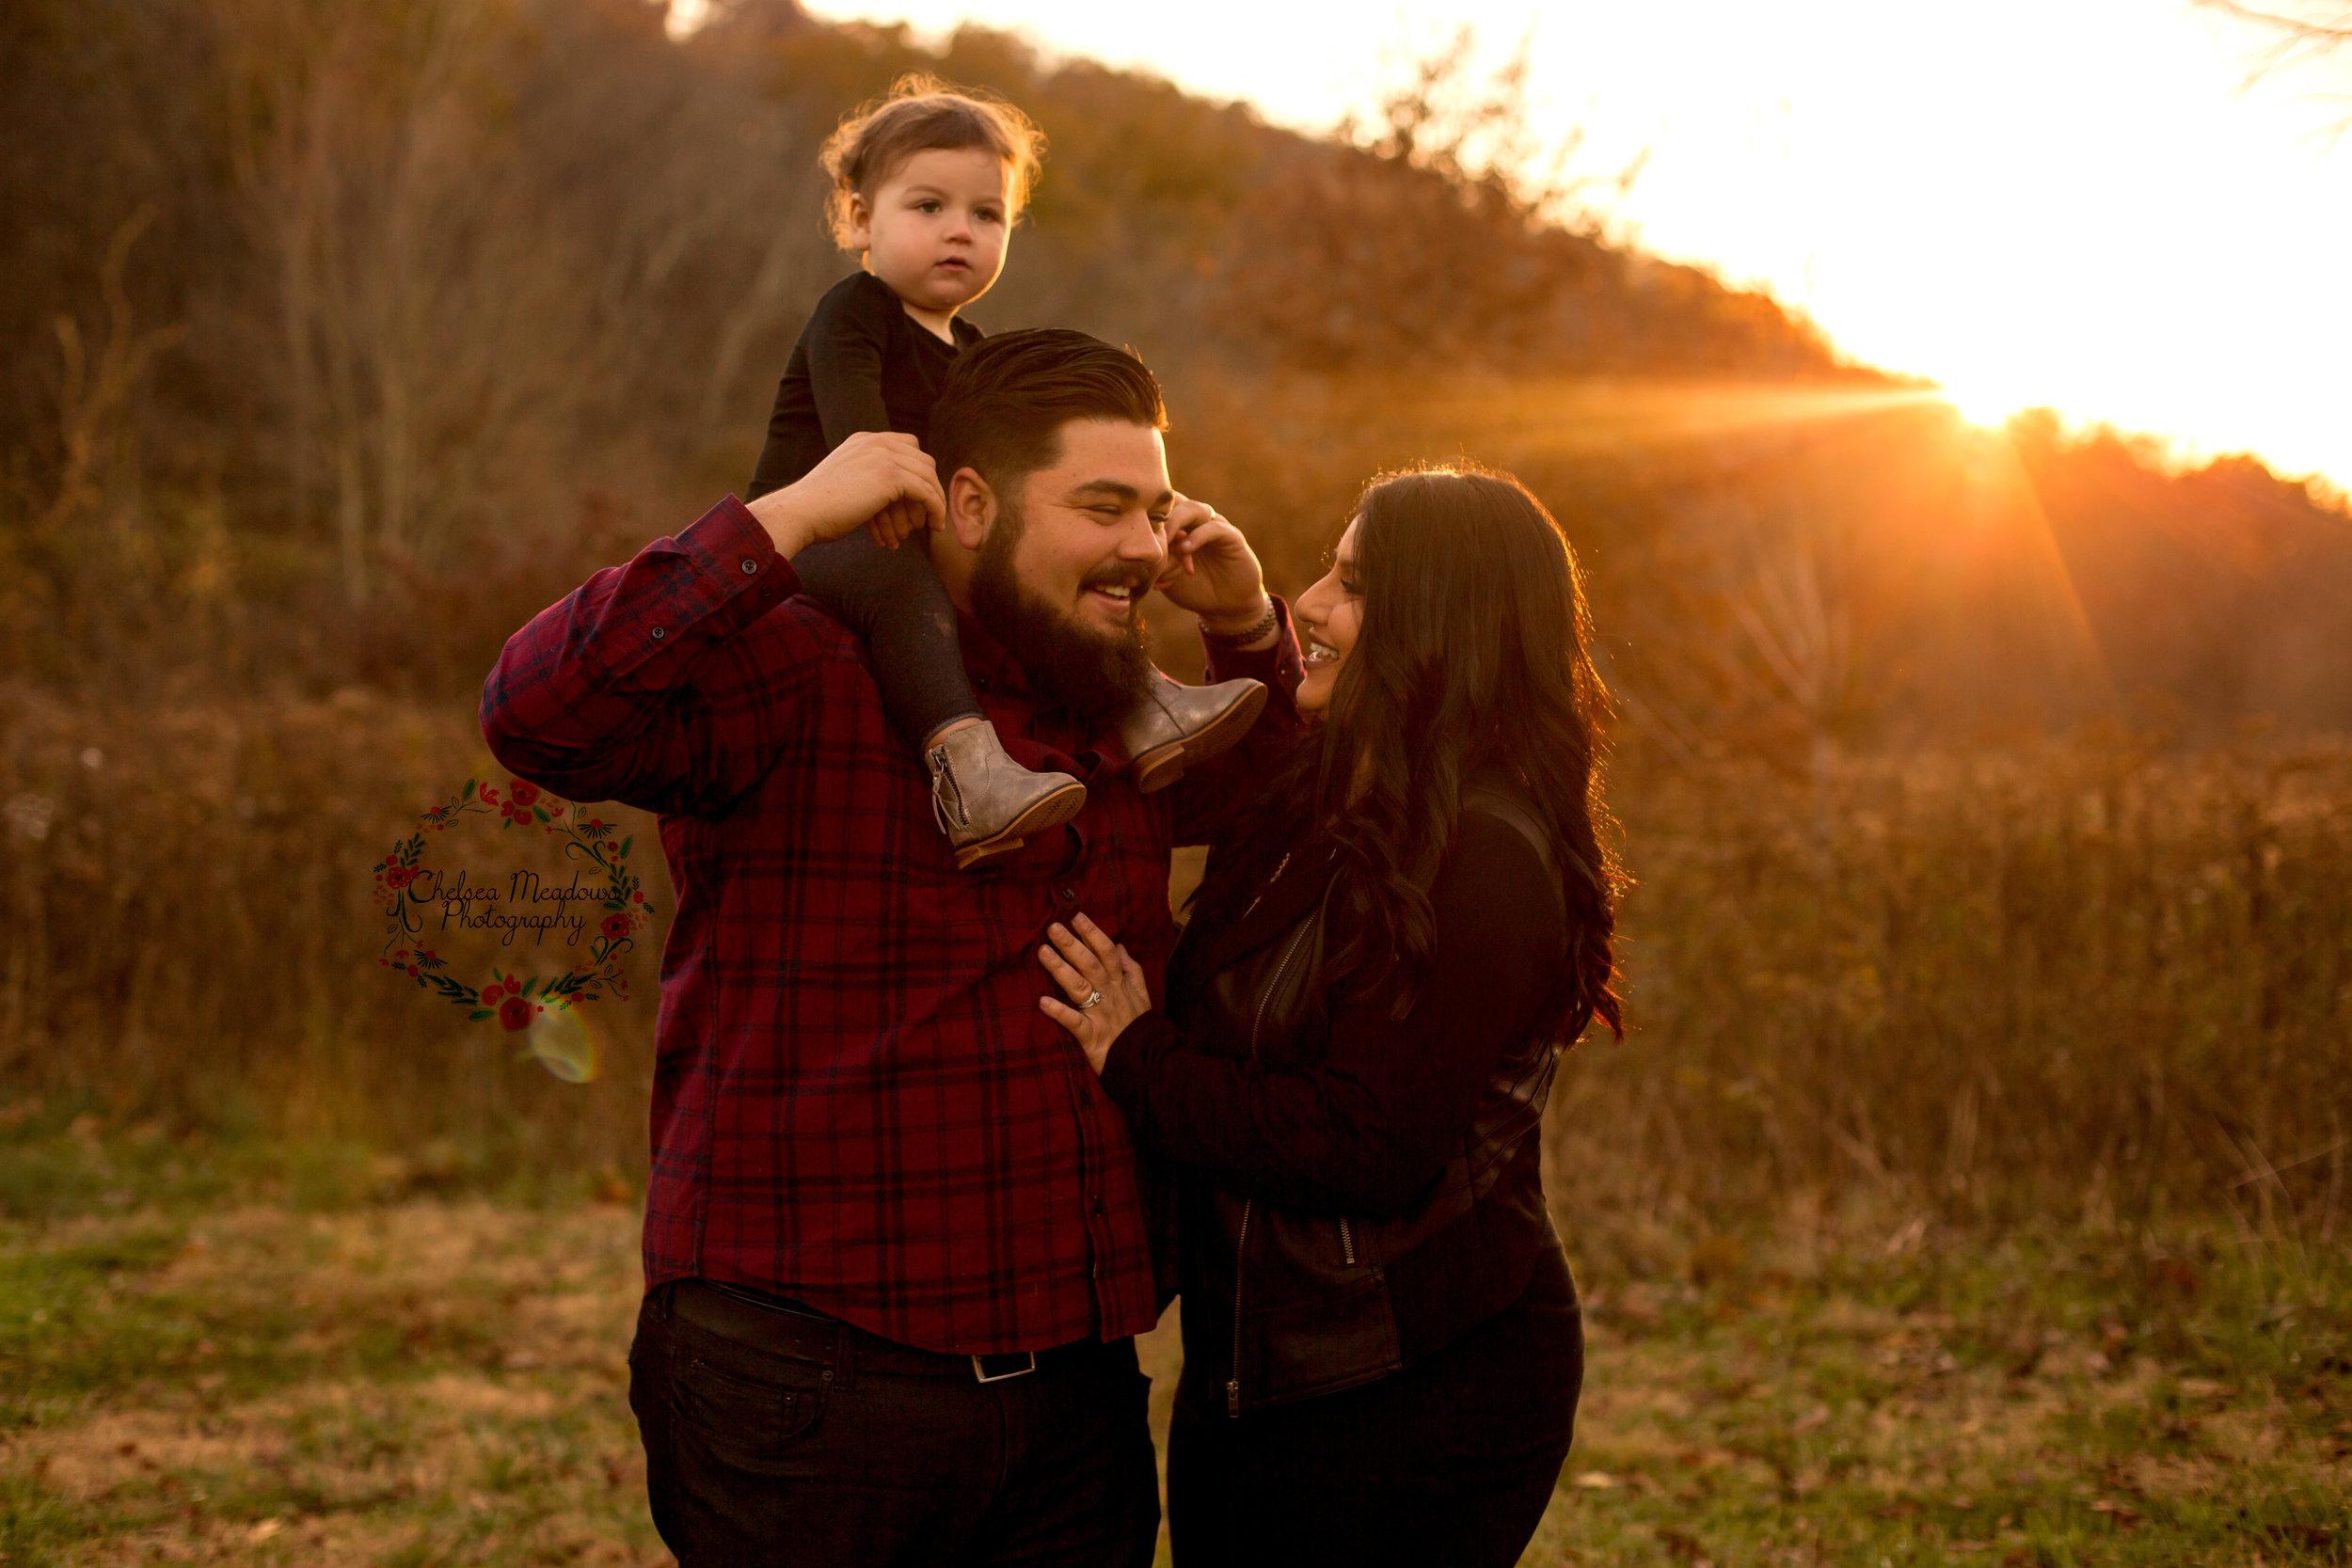 Smith Family Christmas Photos - Nashville Family Photographer - Chelsea Meadows Photography (41).jpg